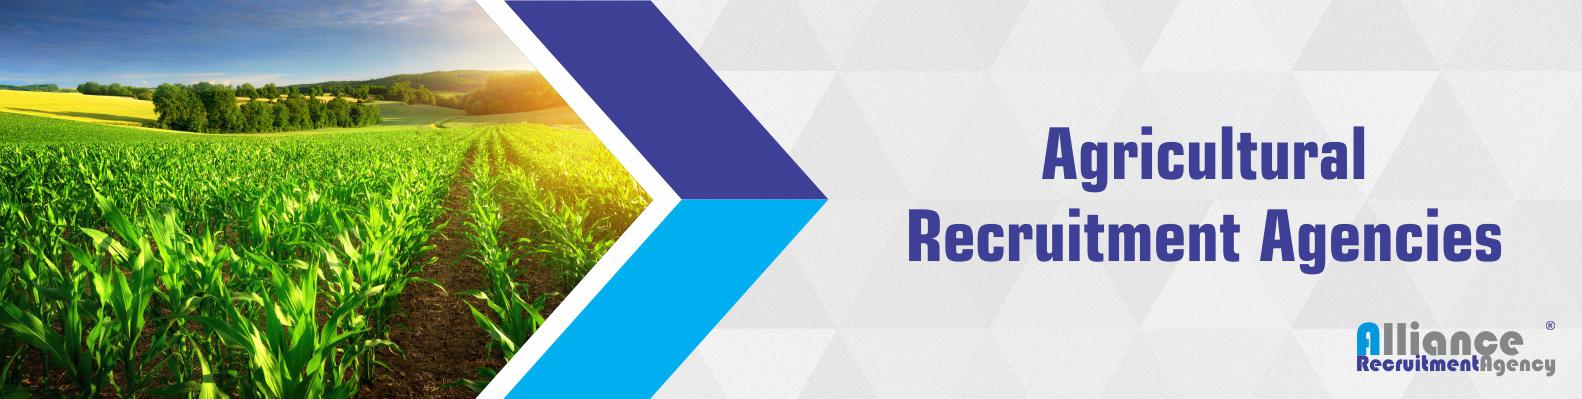 Recruitment Agencies - Agriculture Recruitment Agencies